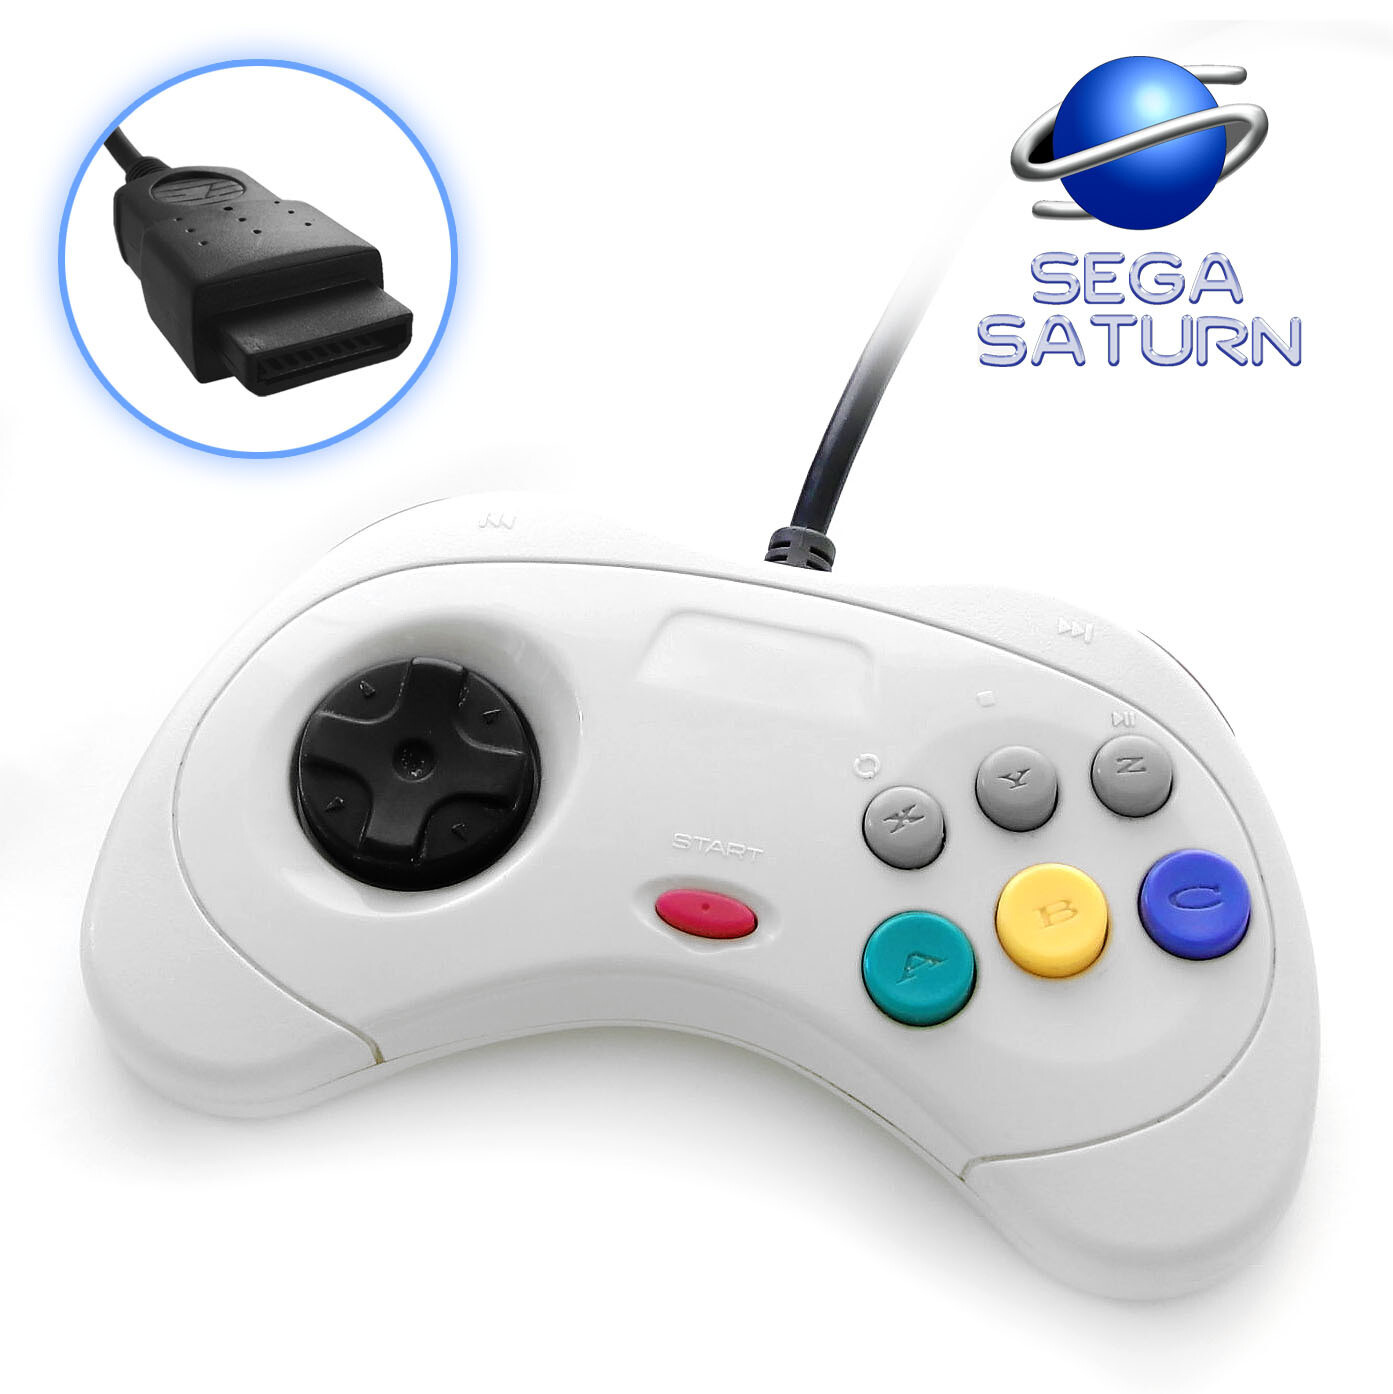 Sega Saturn Controller (White)